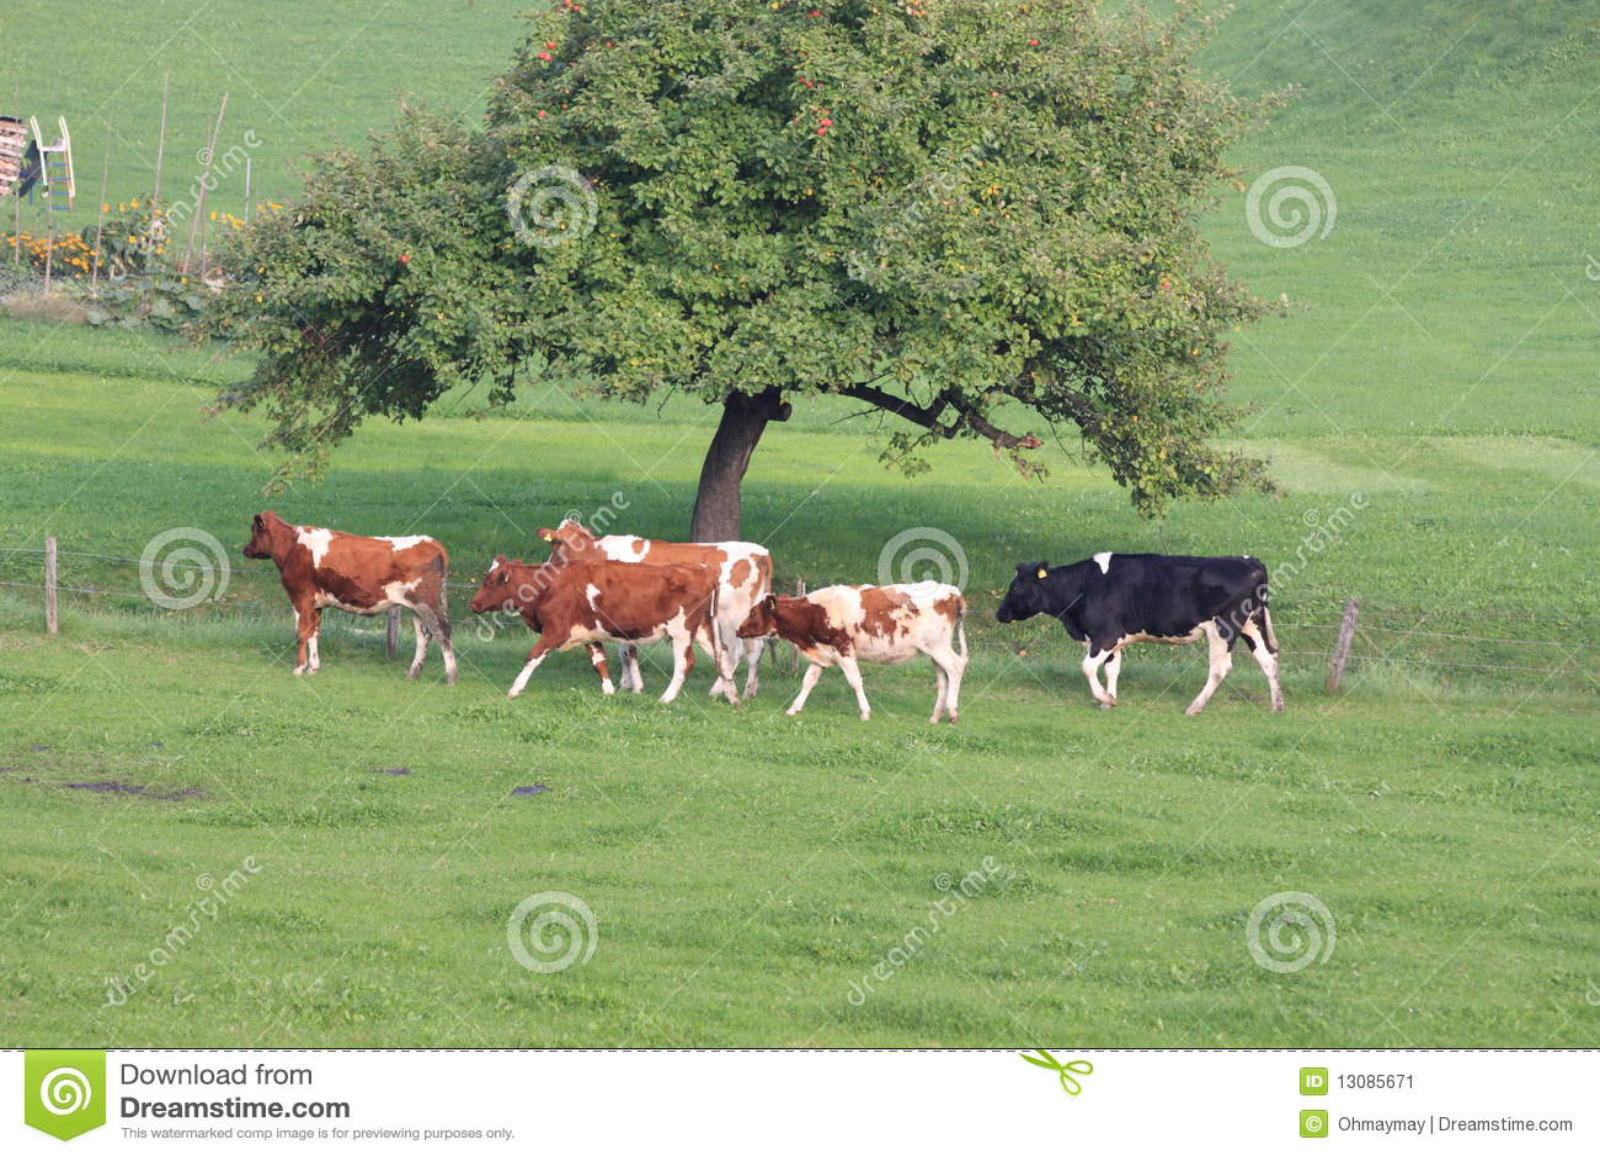 cow breeding business plan